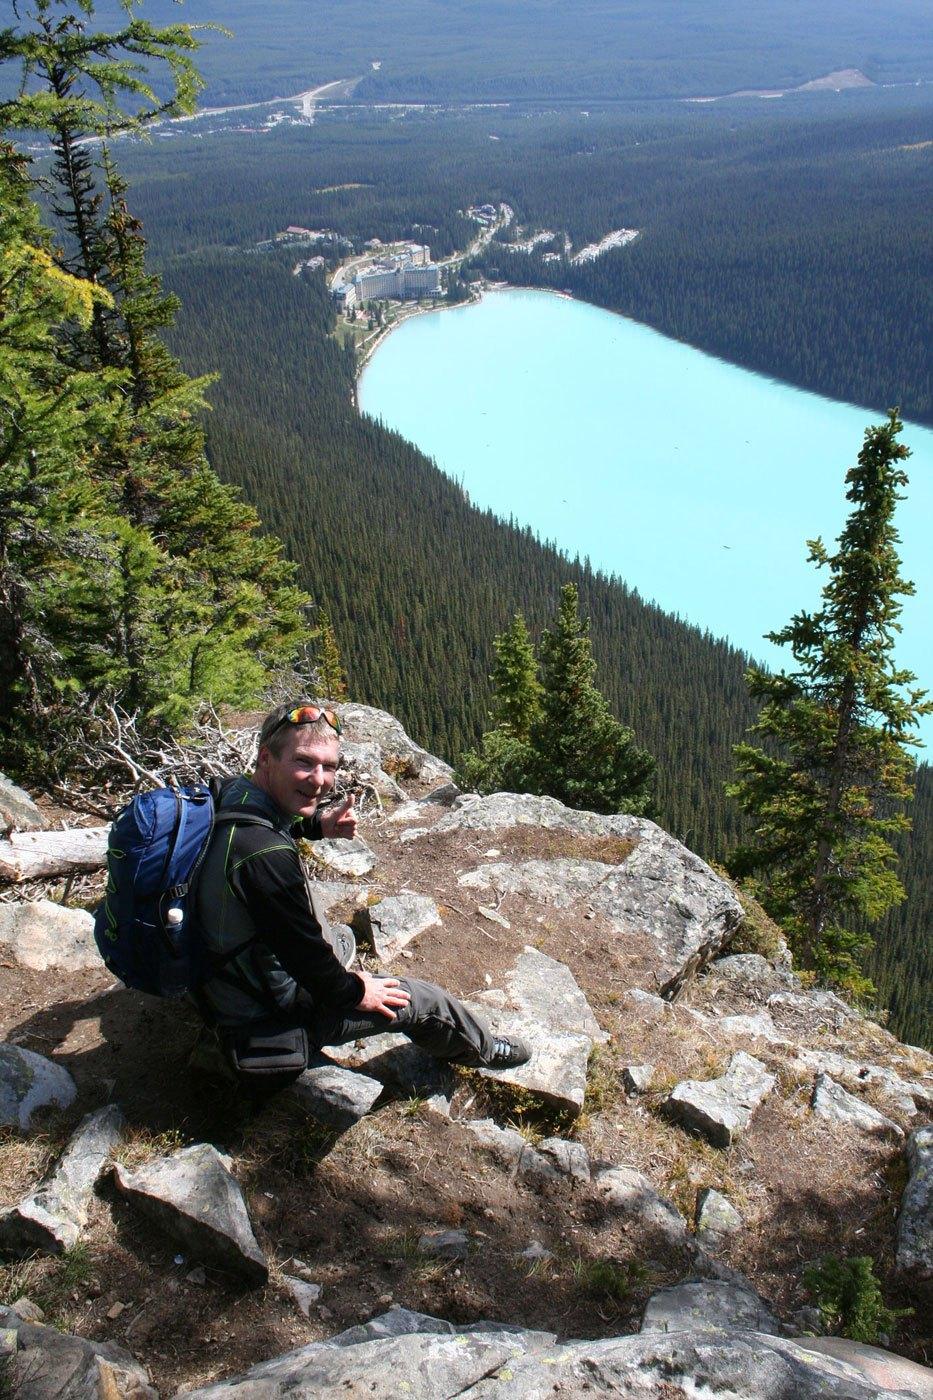 Reiseziele 2017: Kanada